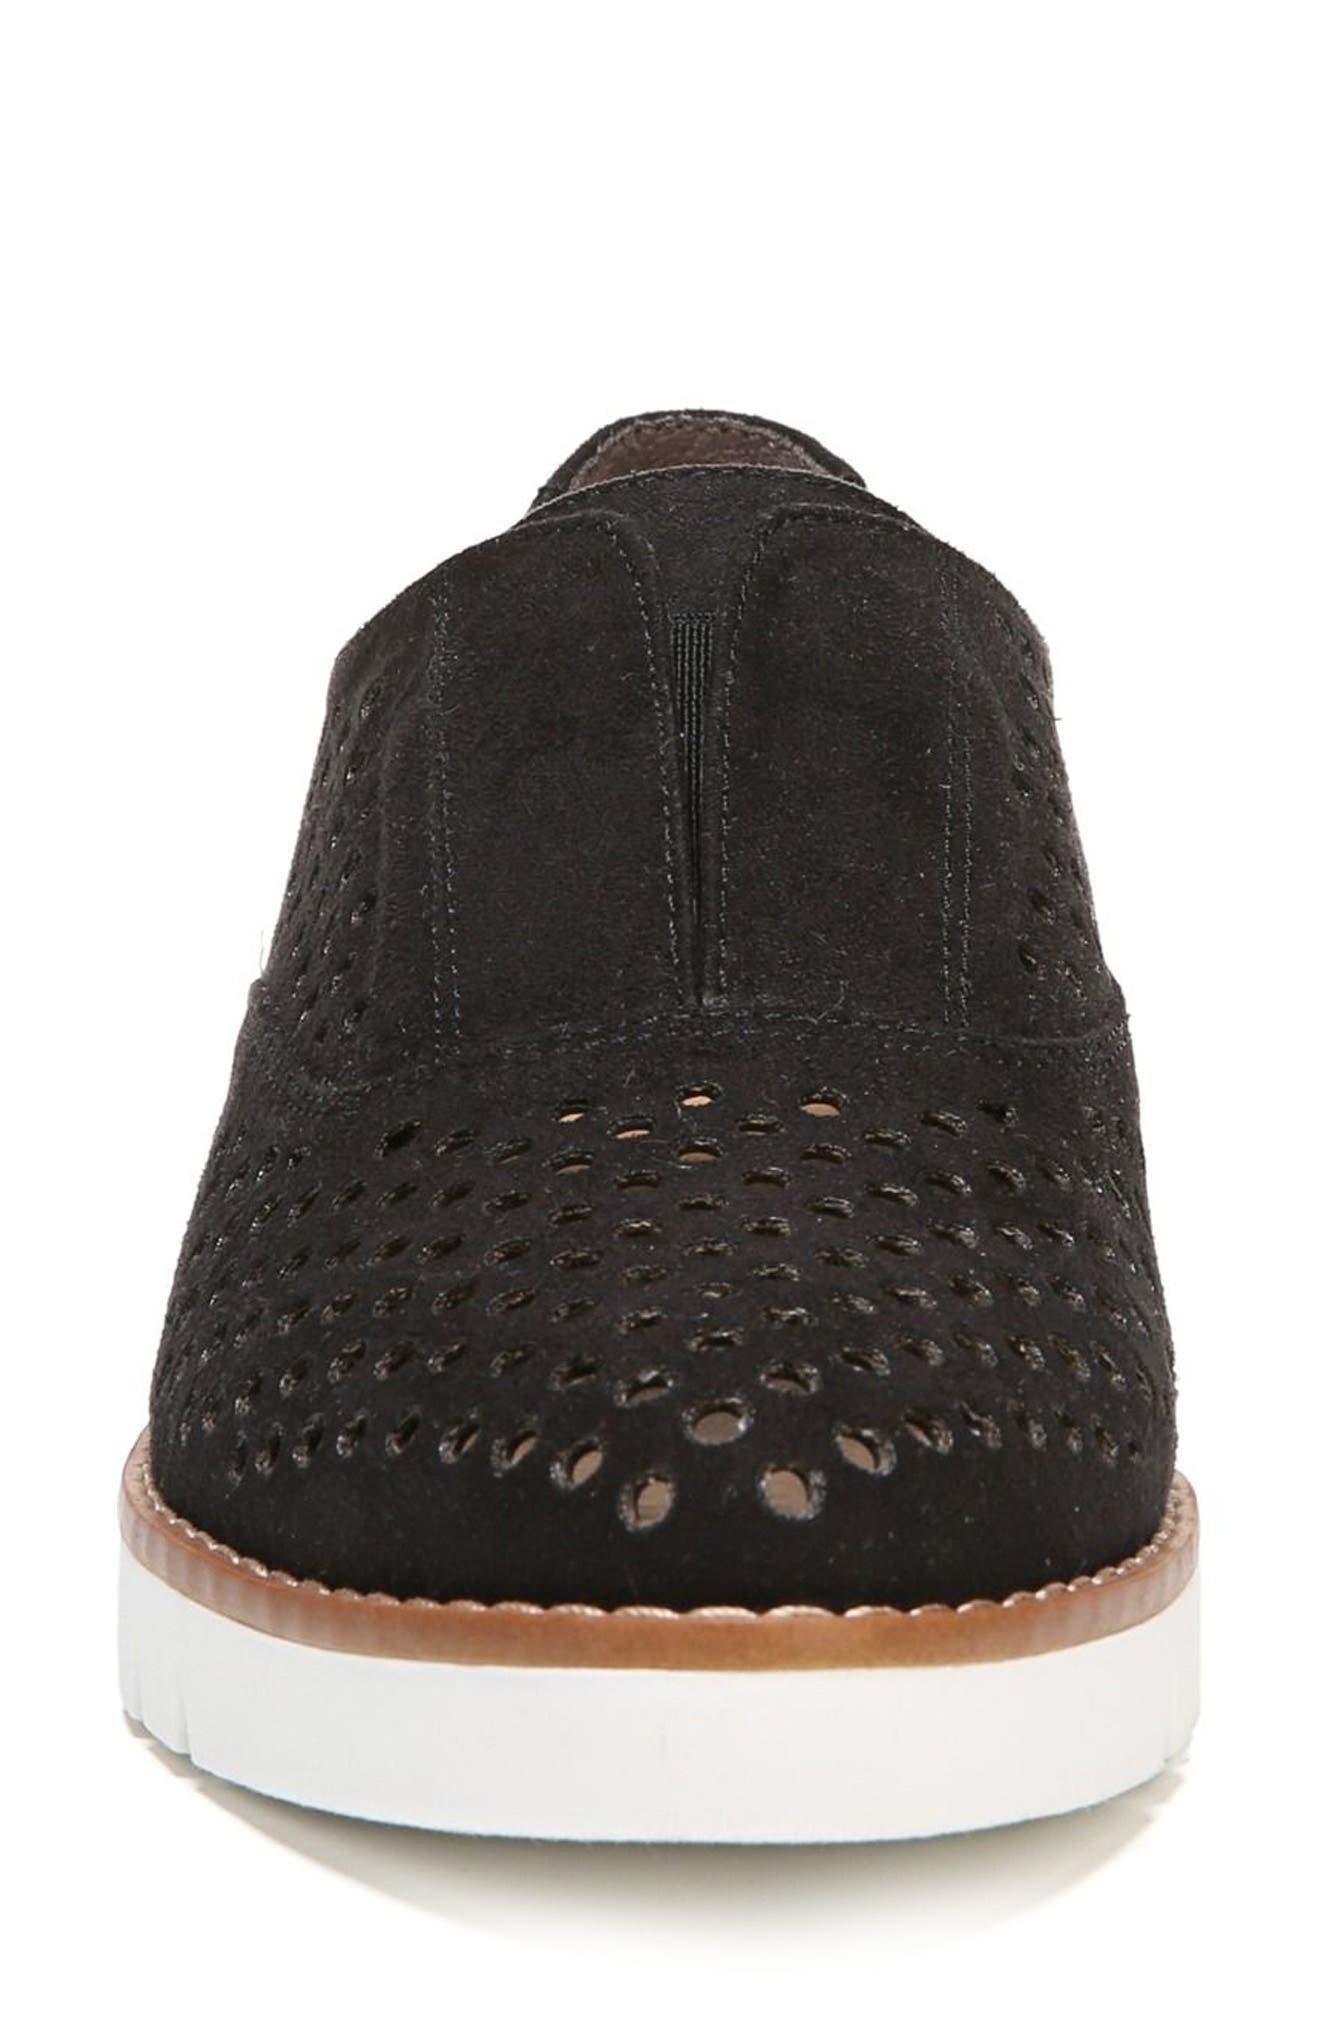 Improve Slip-On Sneaker,                             Alternate thumbnail 4, color,                             Black Fabric